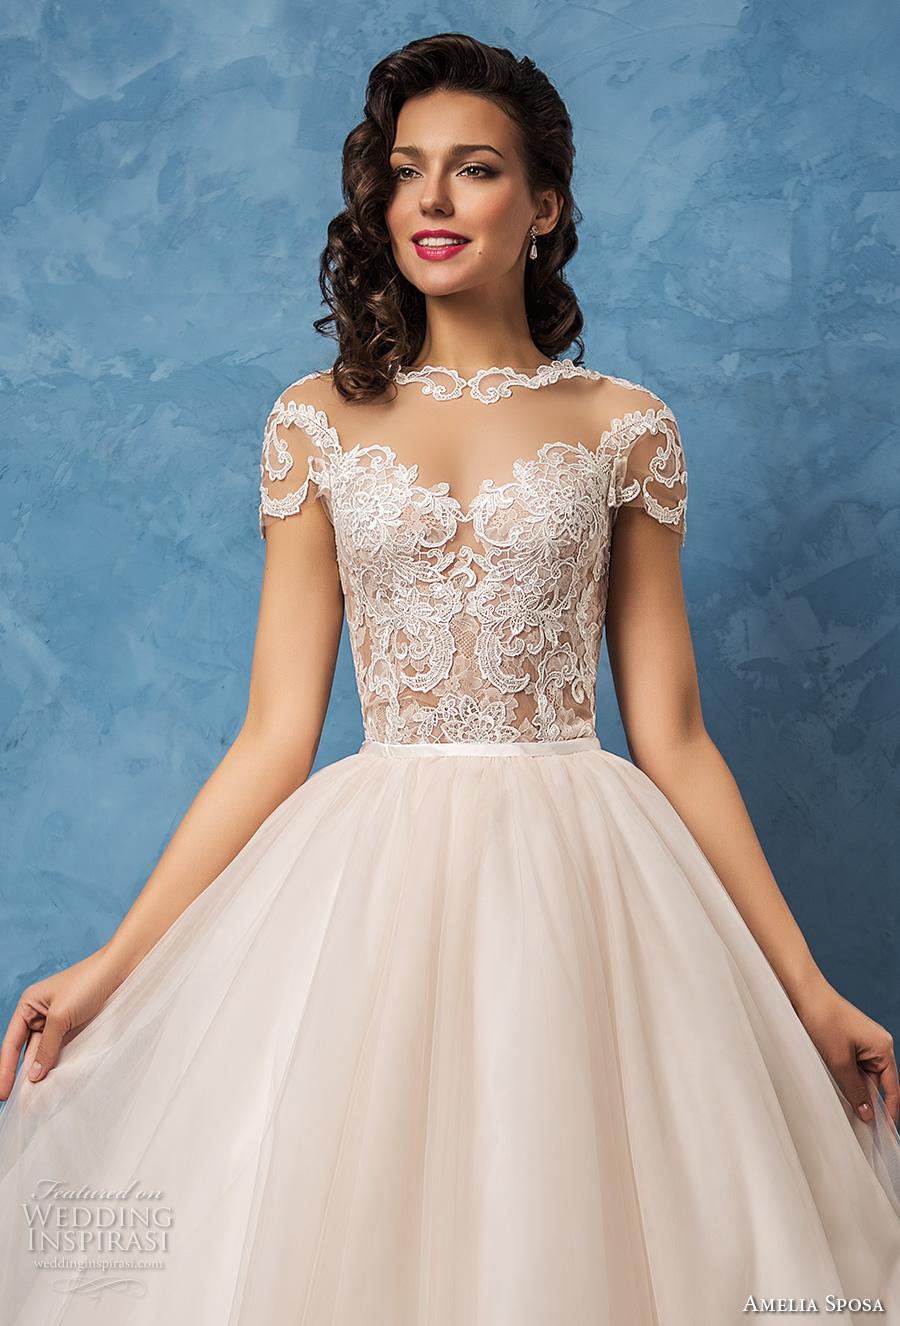 amelia sposa 2017 bridal lace short sleeves sheer bateau sweetheart neckline heavily embellished bodice romantic princess ball gown wedding dress lace back royal train (regina) zv